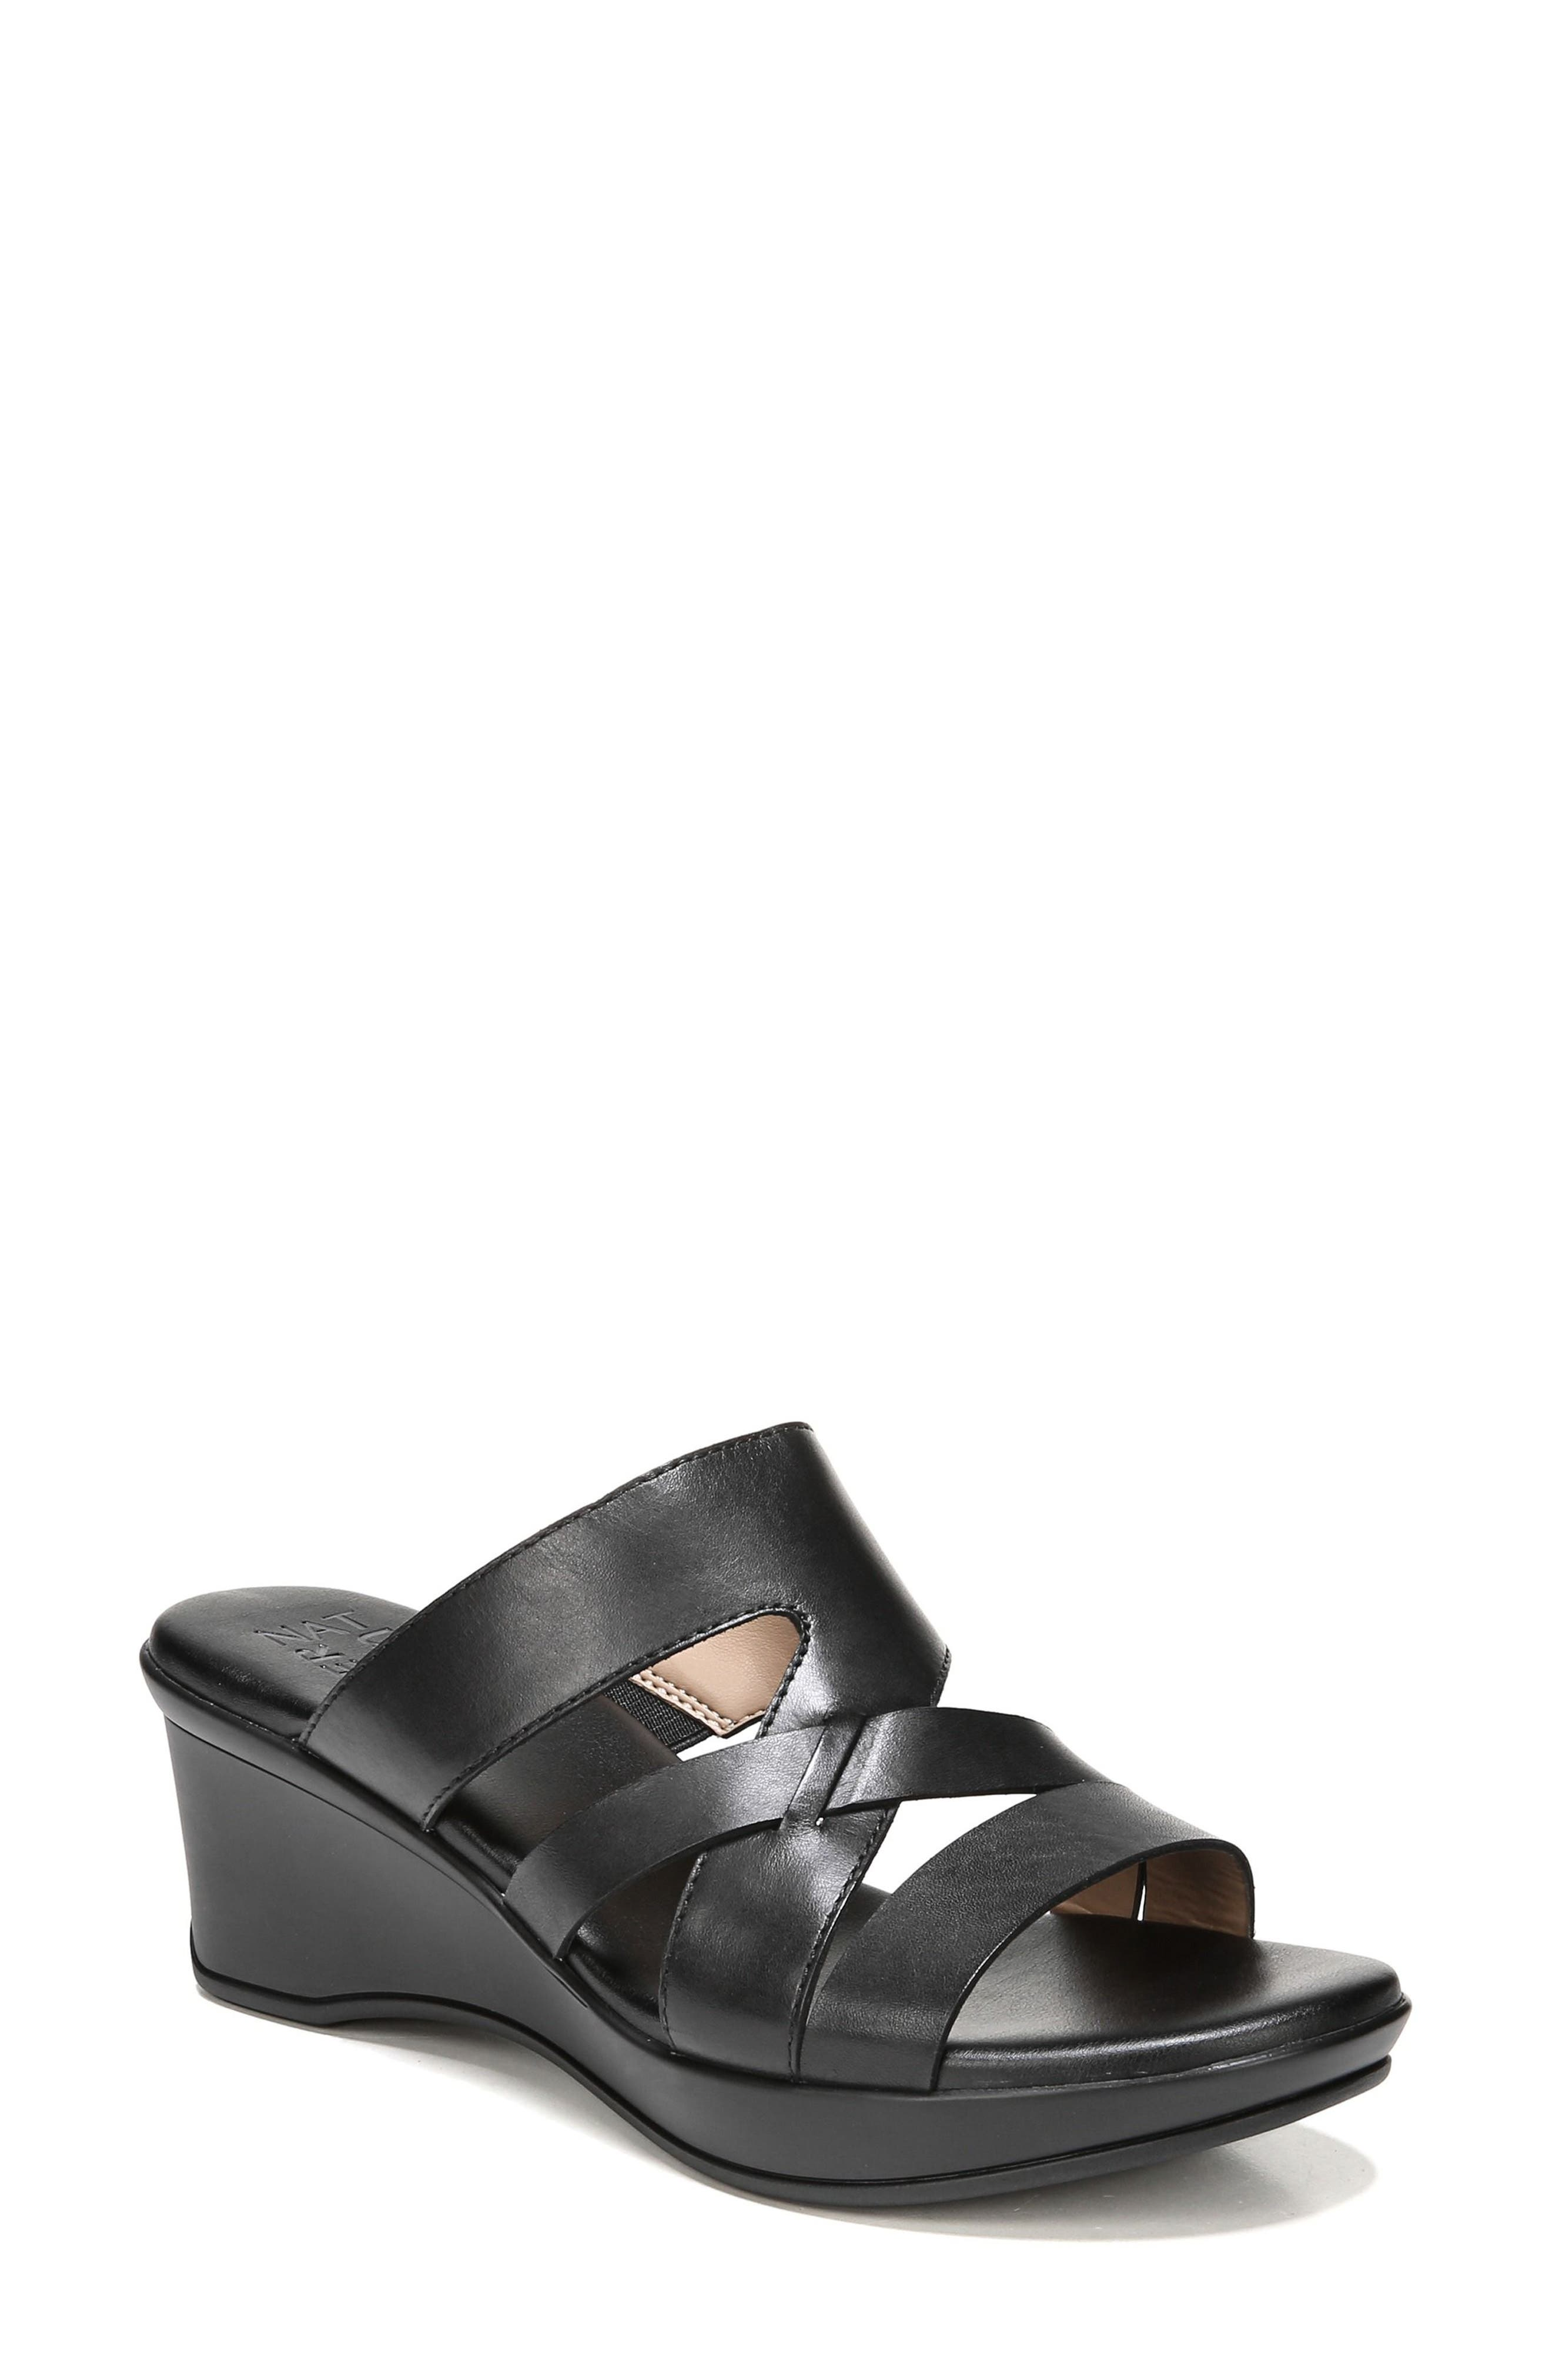 Vivy Wedge Sandal,                         Main,                         color, BLACK LEATHER